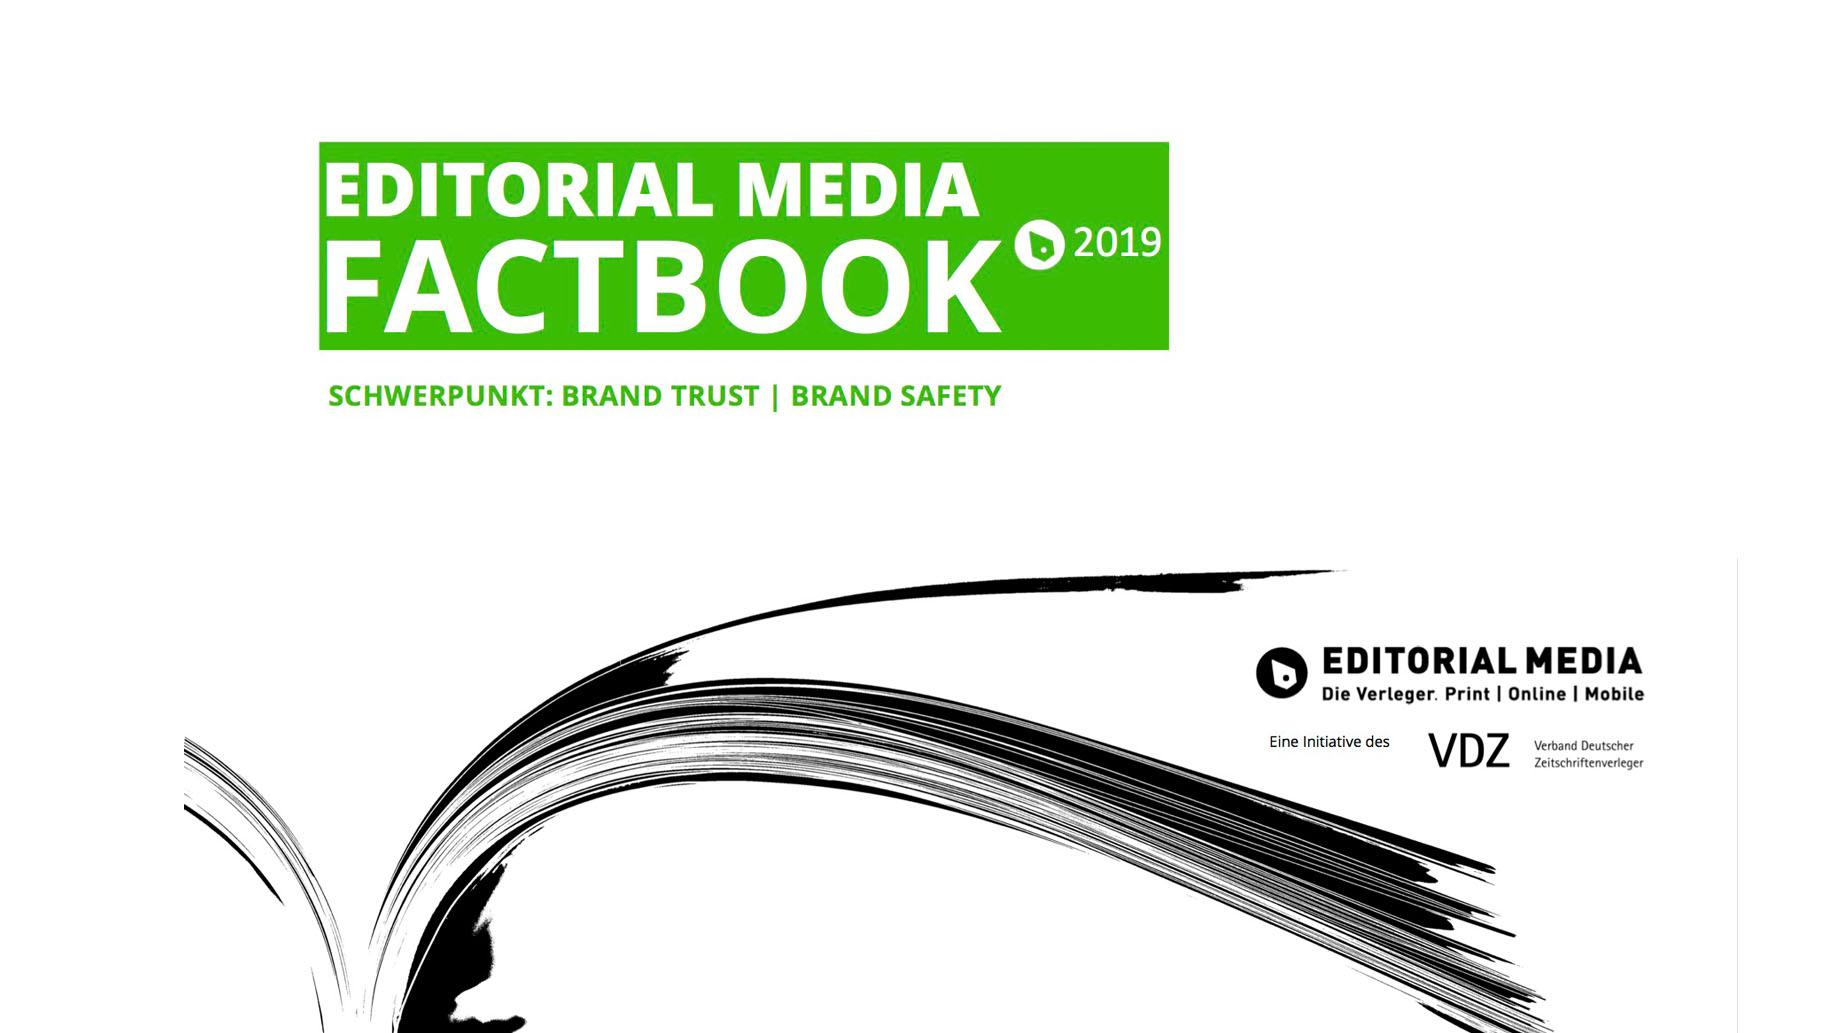 factbook-editorial-media-2019-1